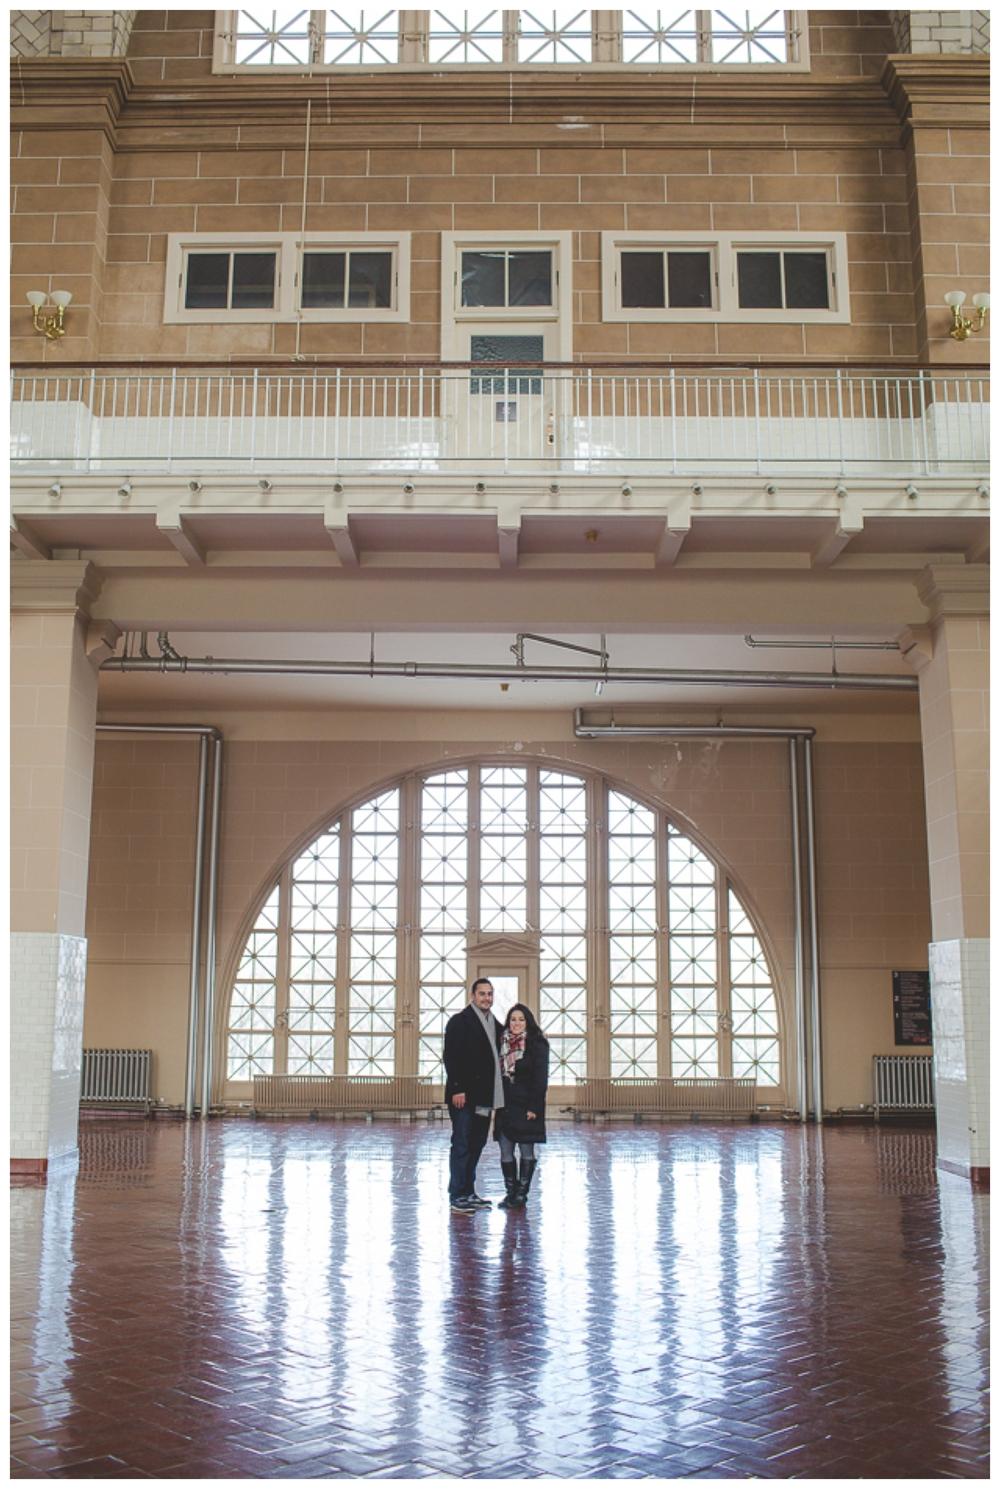 TaylorLaurenBarker - Frank&Marina - Ellis Island Proposal_0017.jpg